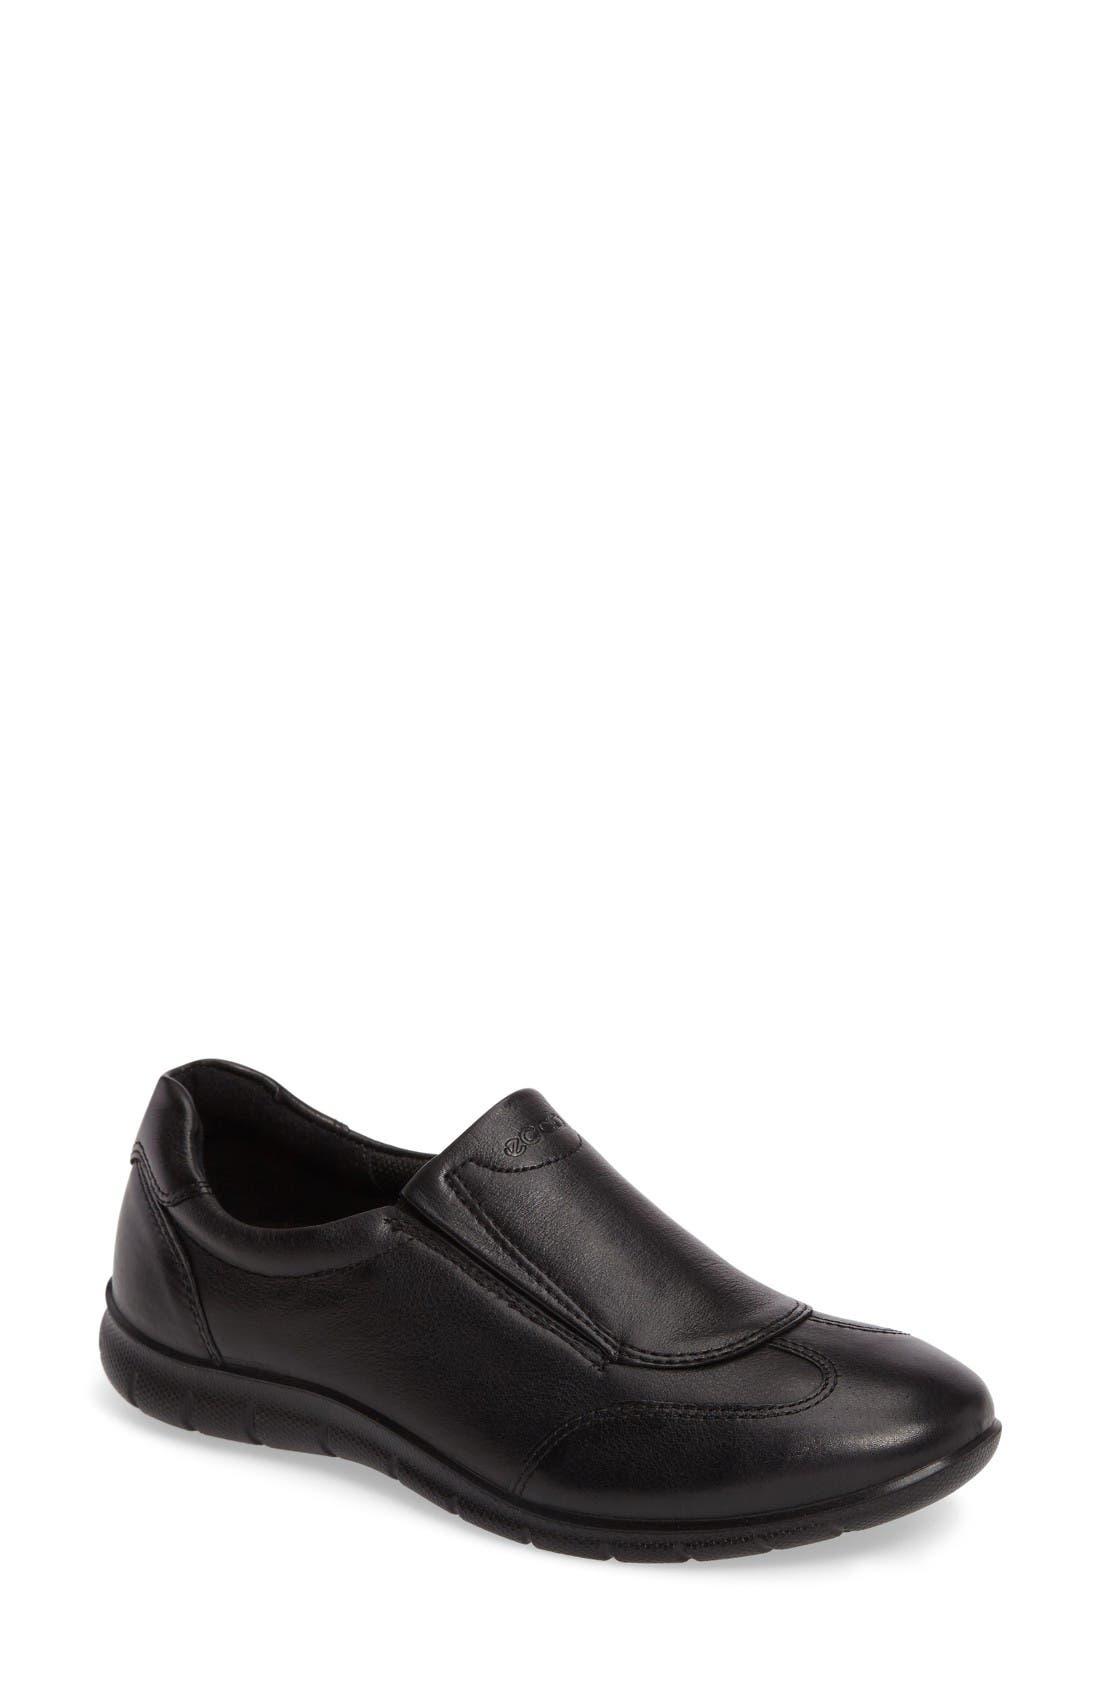 Babett II Slip-On,                         Main,                         color, Black Leather